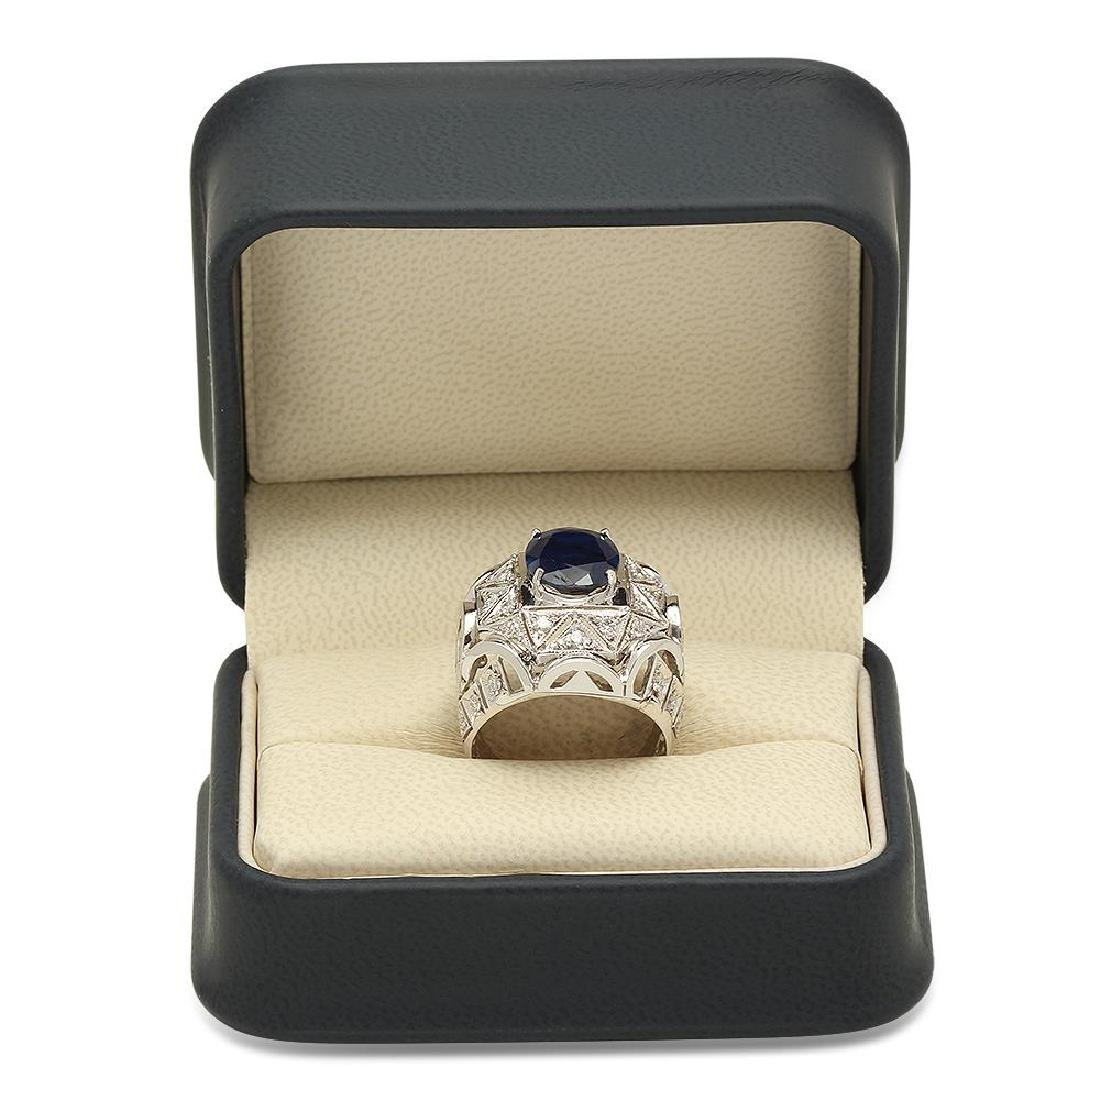 14K Gold 5.11ct Sapphire 1.07cts Diamond Ring - 4